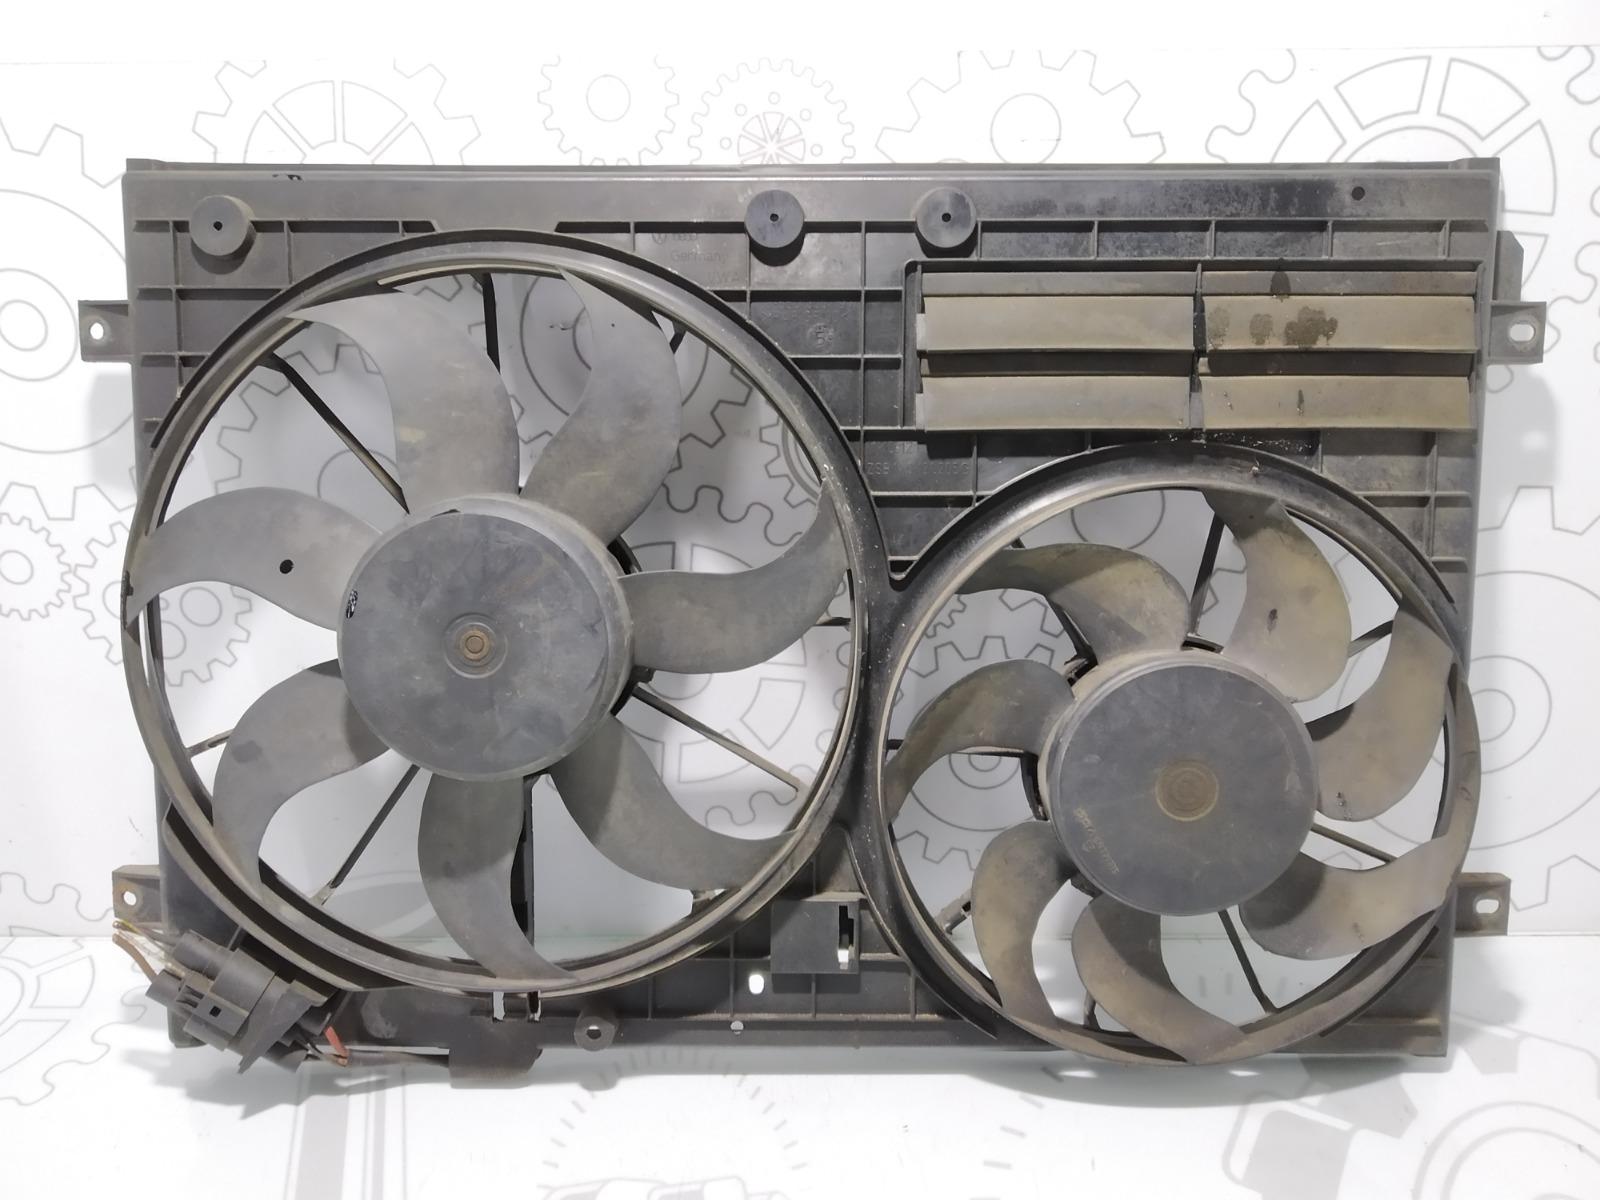 Вентилятор радиатора Volkswagen Passat B6 2.0 TDI 2005 (б/у)